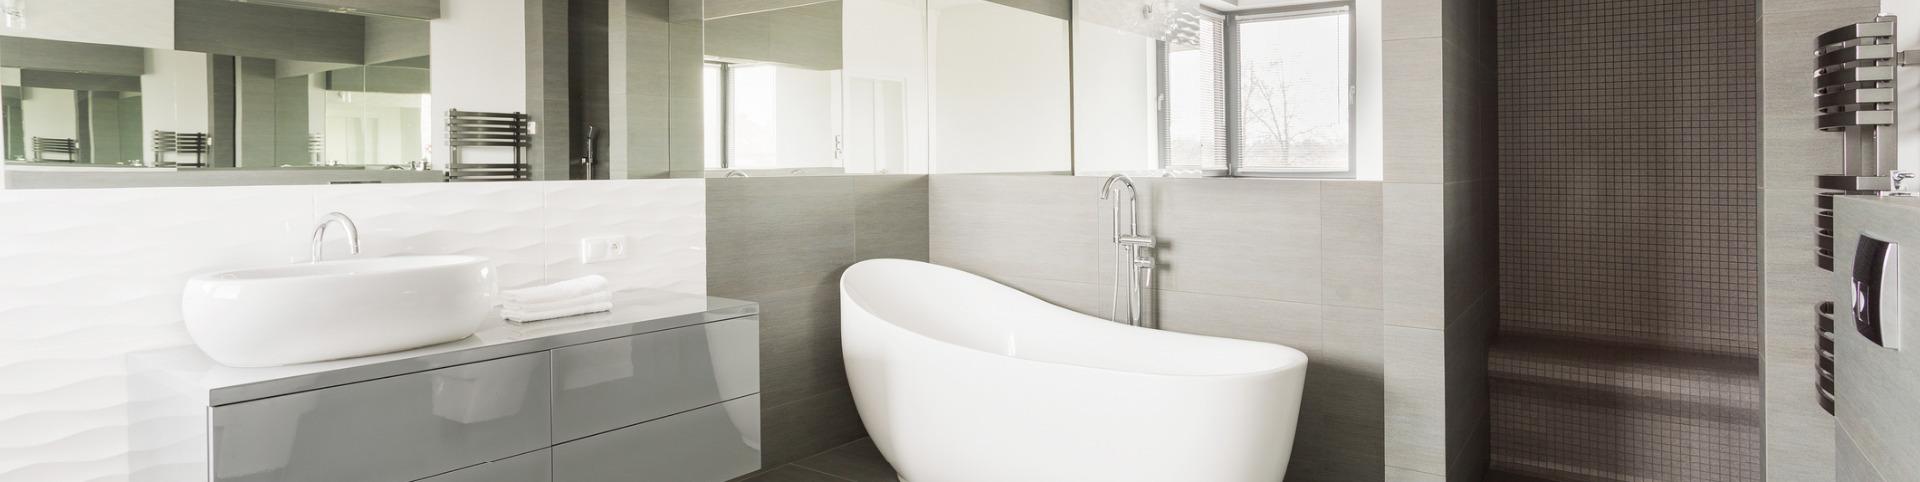 Bathroom installations northampton h2o plumbing heating for Bathroom design northampton